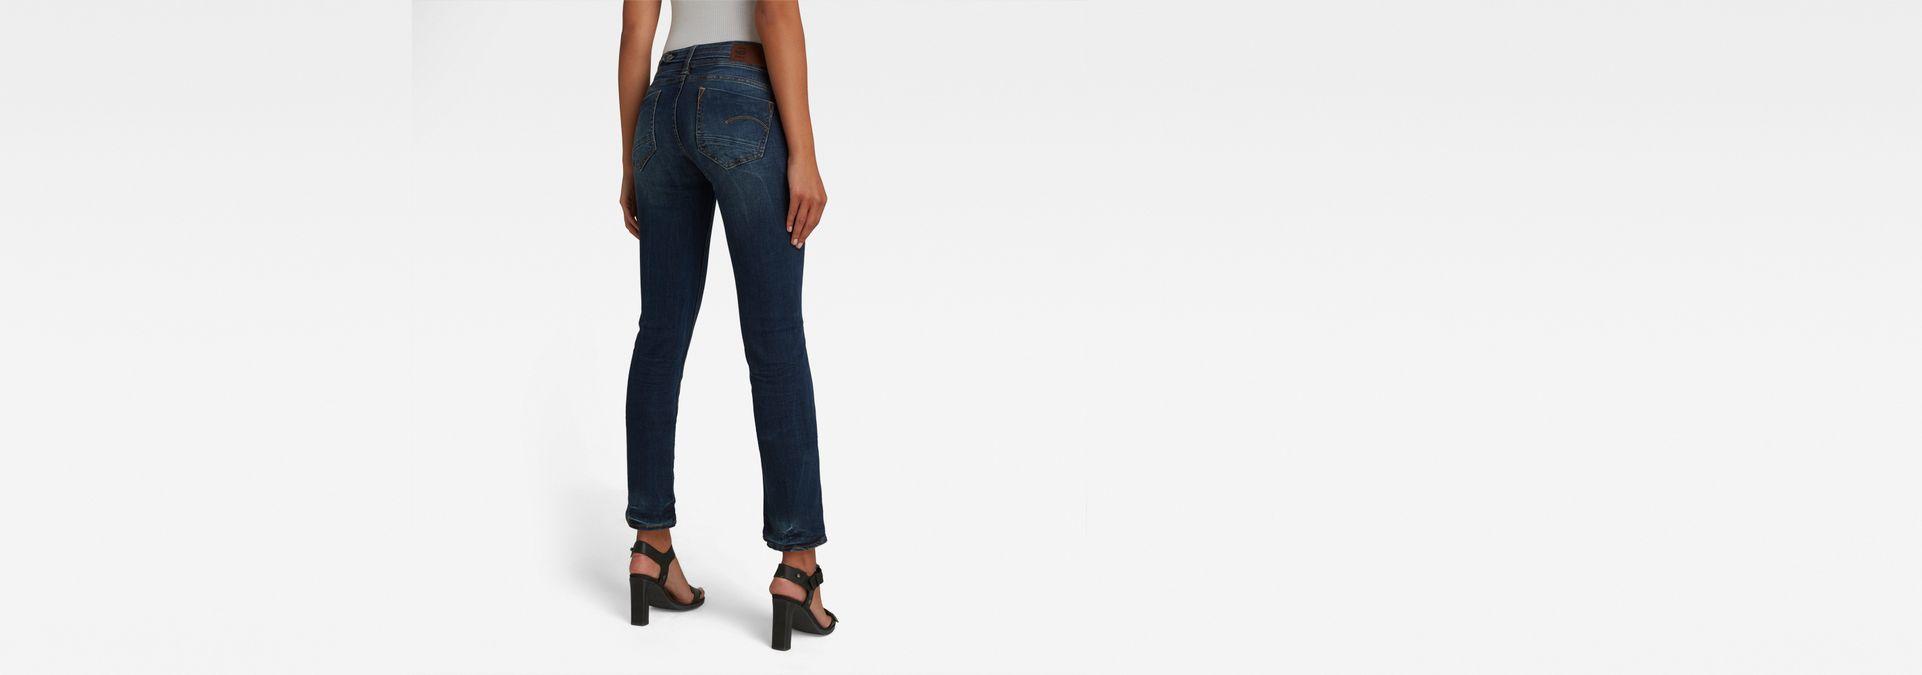 Star JeansDark Midge Femmes Raw® Aged Saddle Straight G bWDHIeE29Y